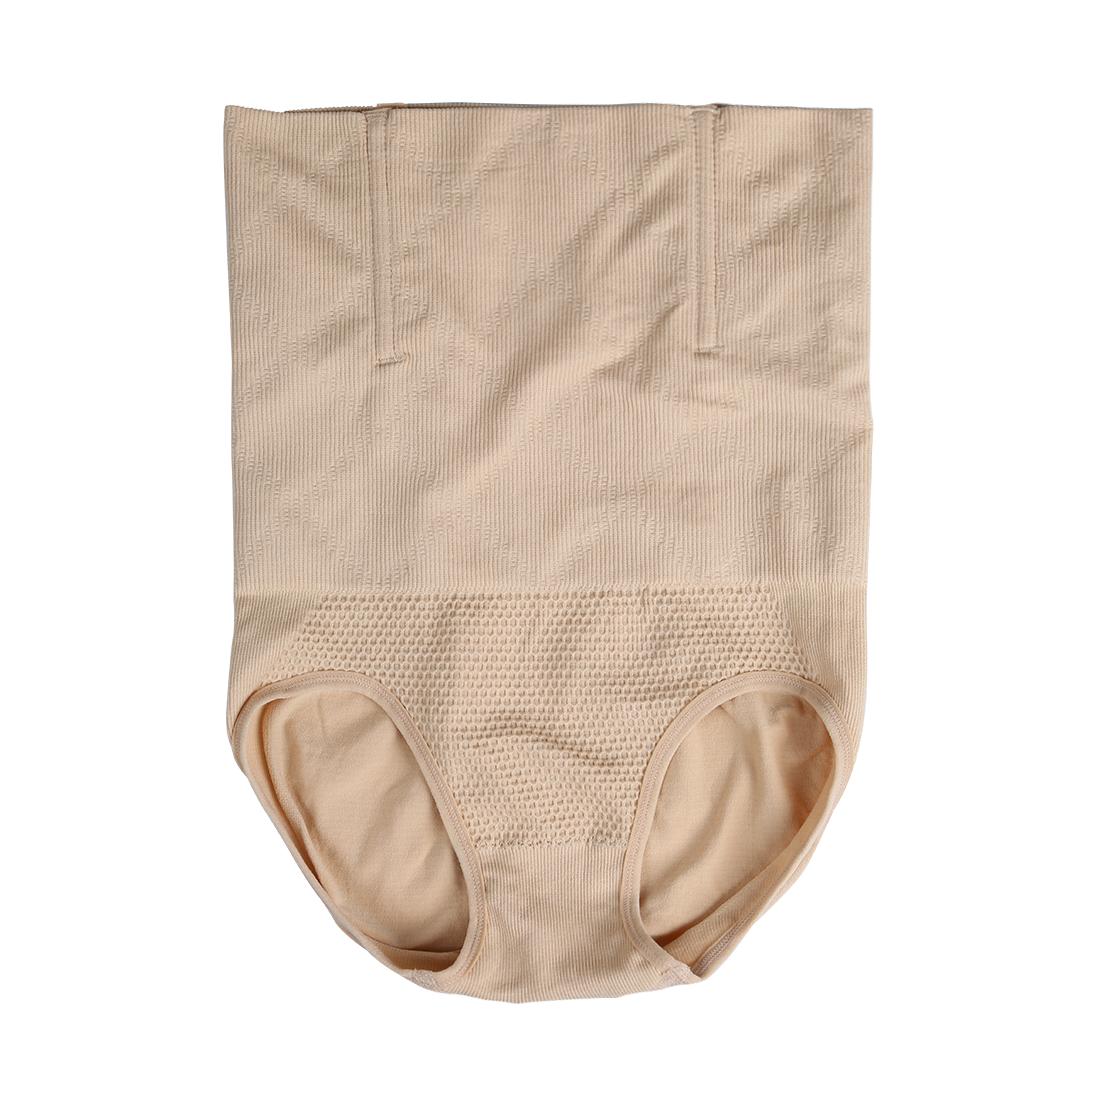 Women Tummy Control Shapewear Postpartum High Waist Brief Beige M/L